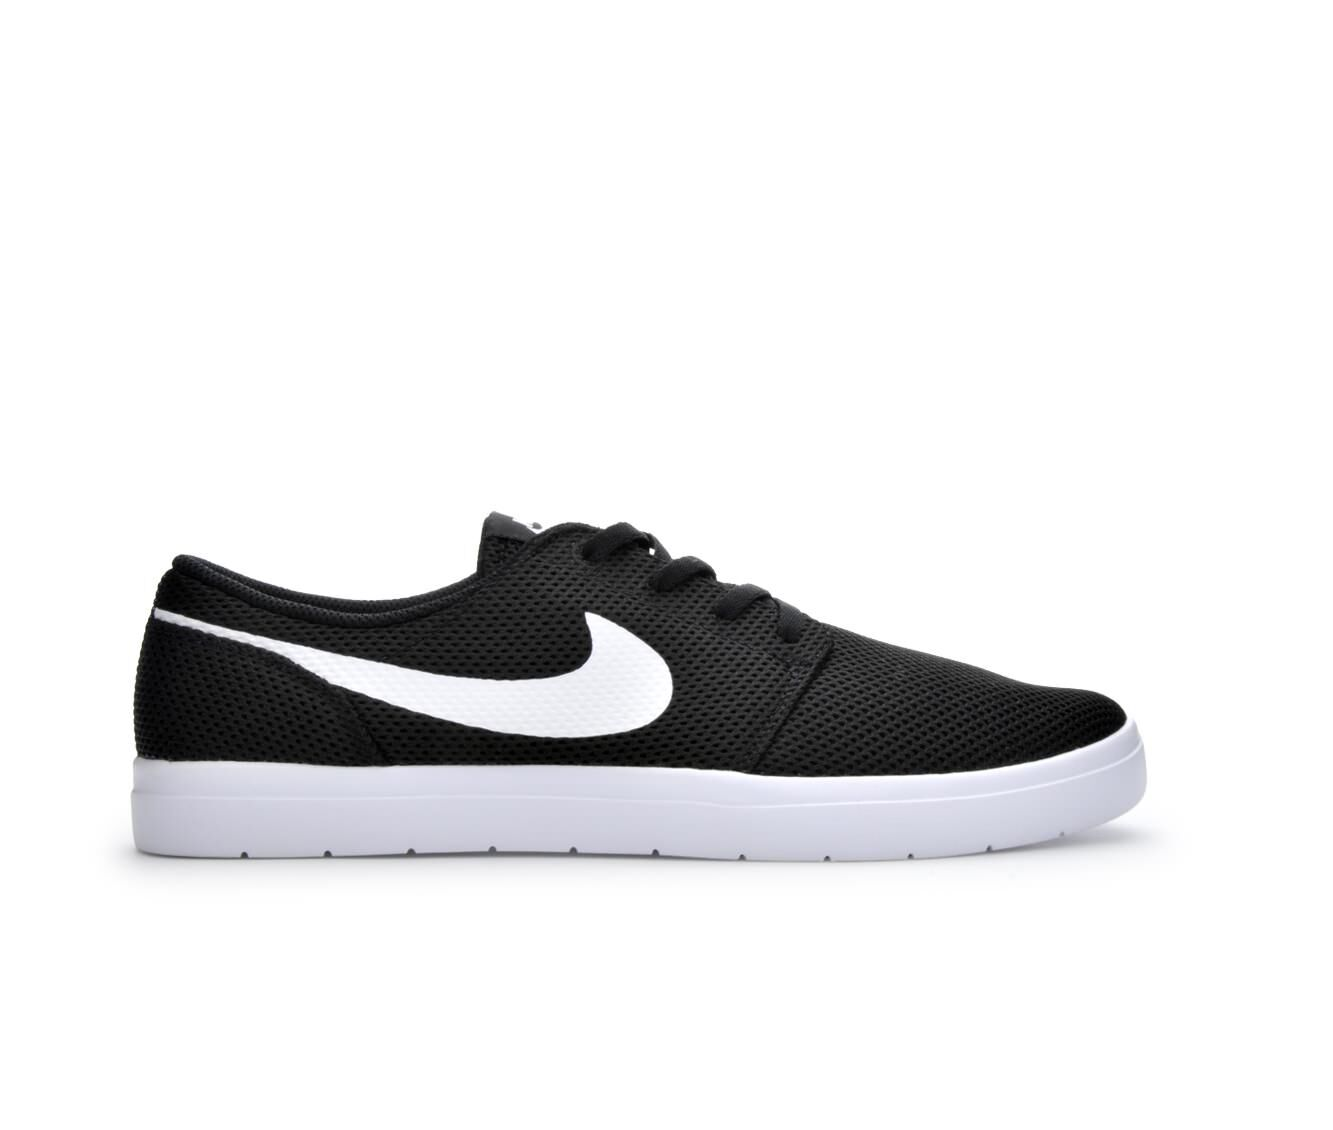 Images. Men's Nike SB Portmore II Ultralite Skate Shoes